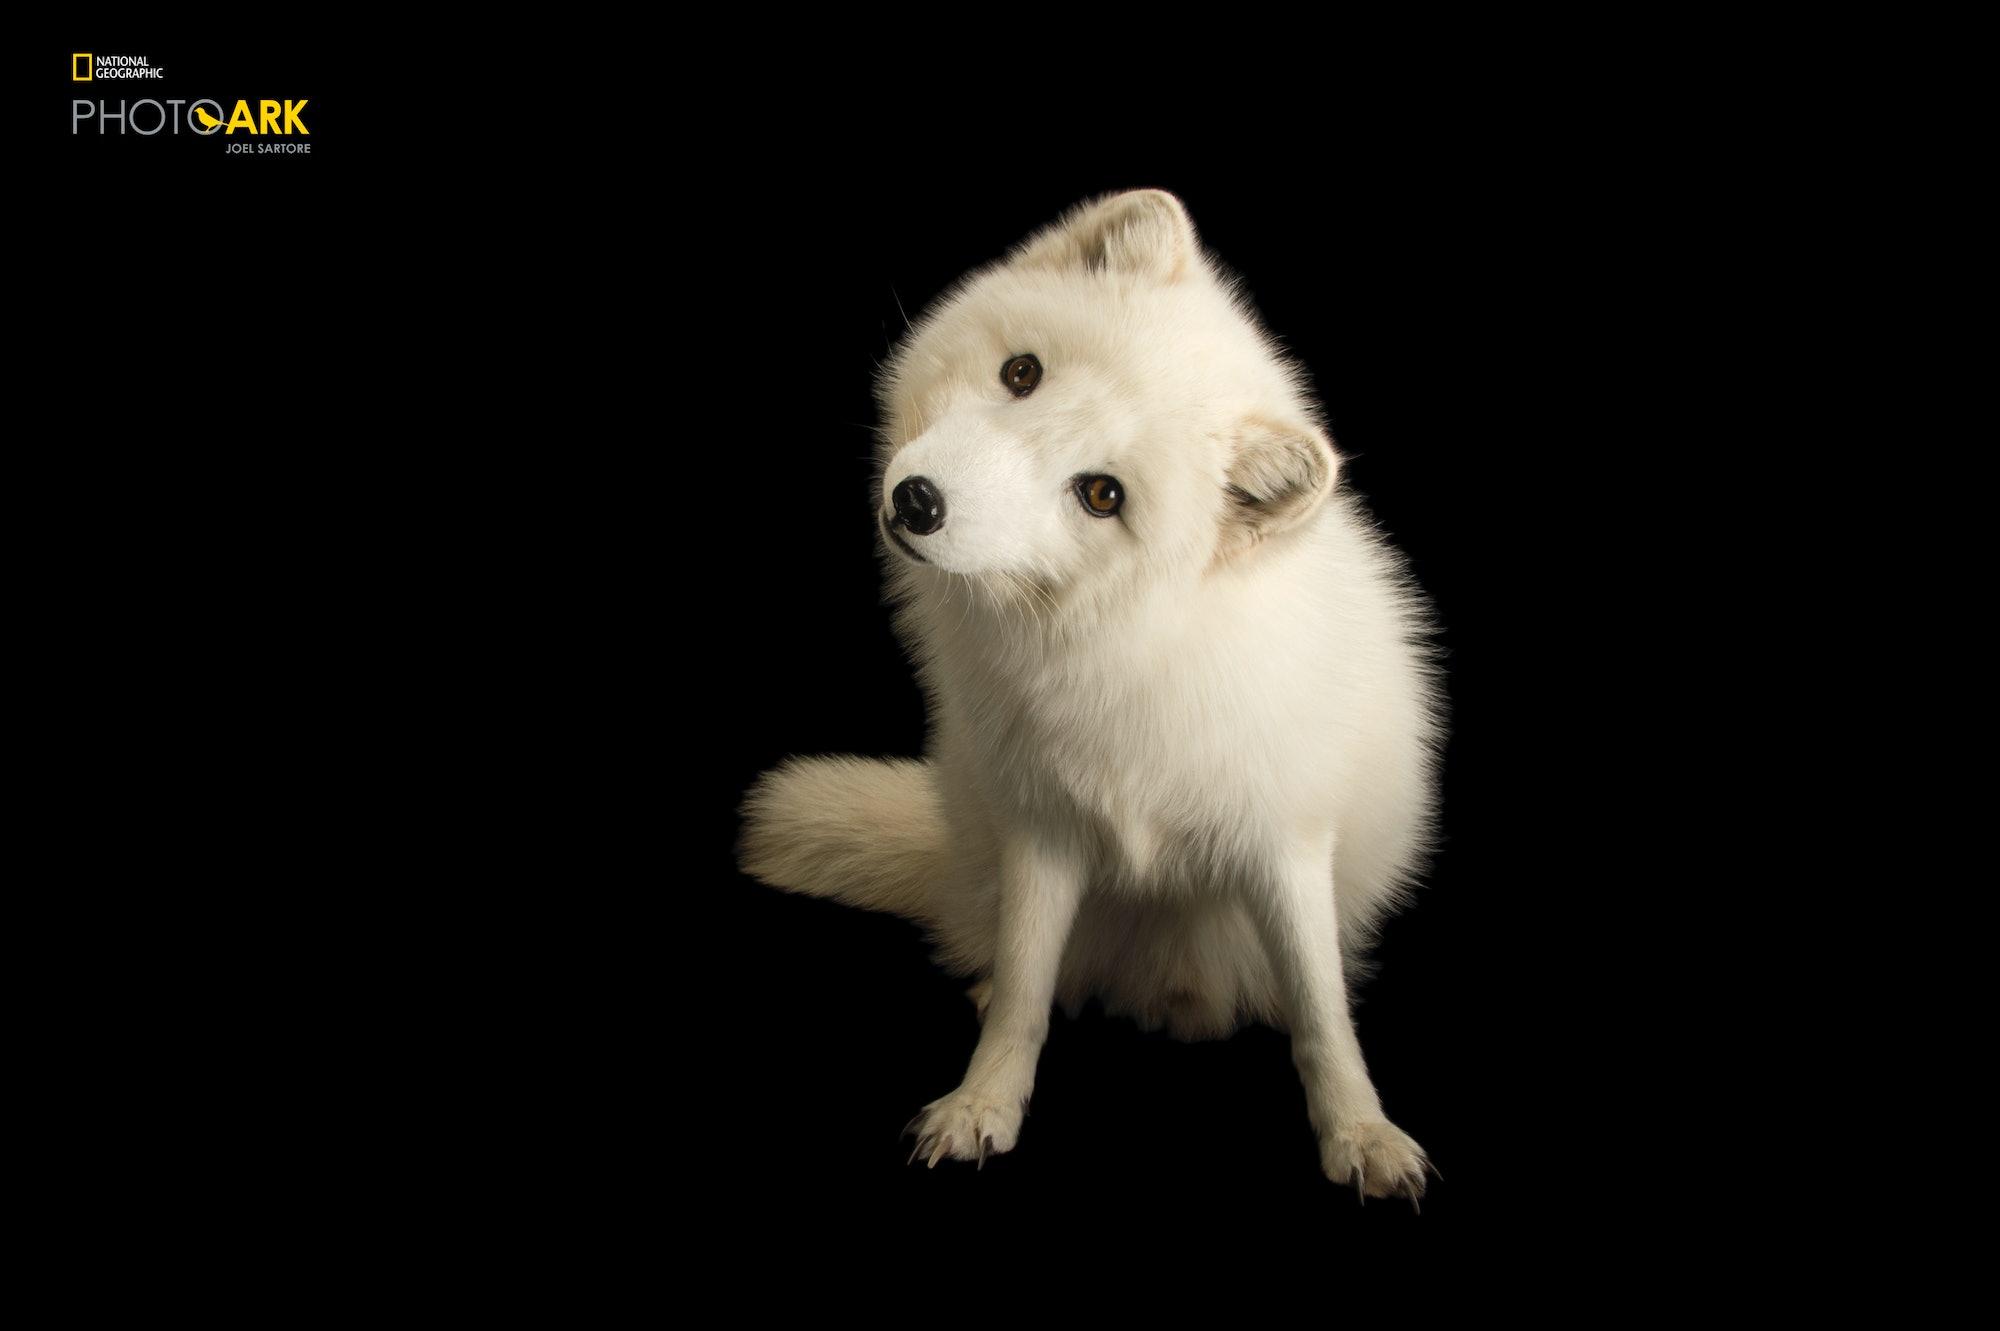 joel sartore the photo ark arctic fox